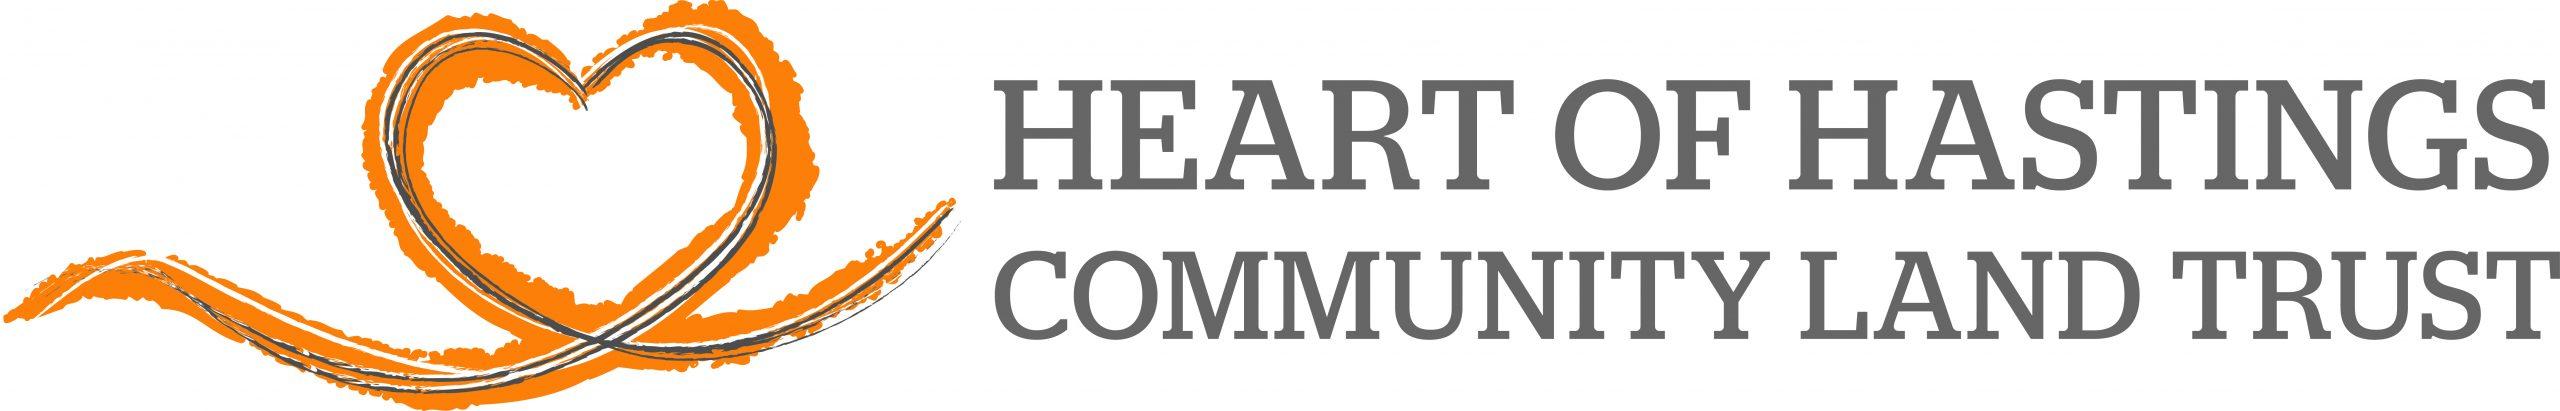 Heart of Hastings Web banner